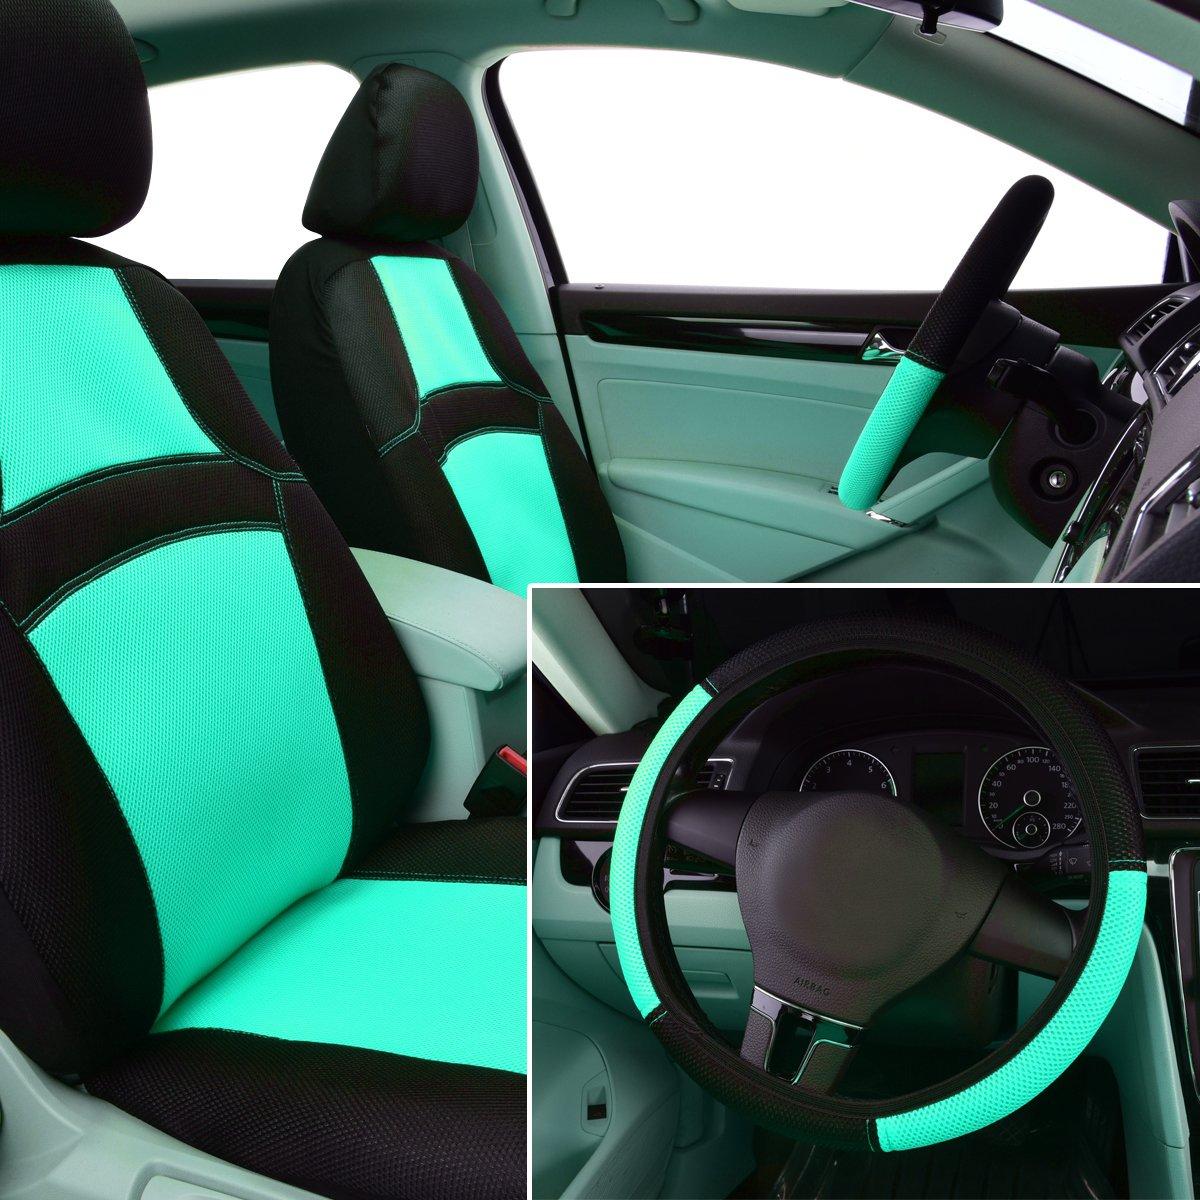 14PCS, Sport Orange 100/% Breathable with 5mm Composite Sponge Inside,Airbag Compatible CAR PASS Rainbow Universal Fit Car Seat Cover